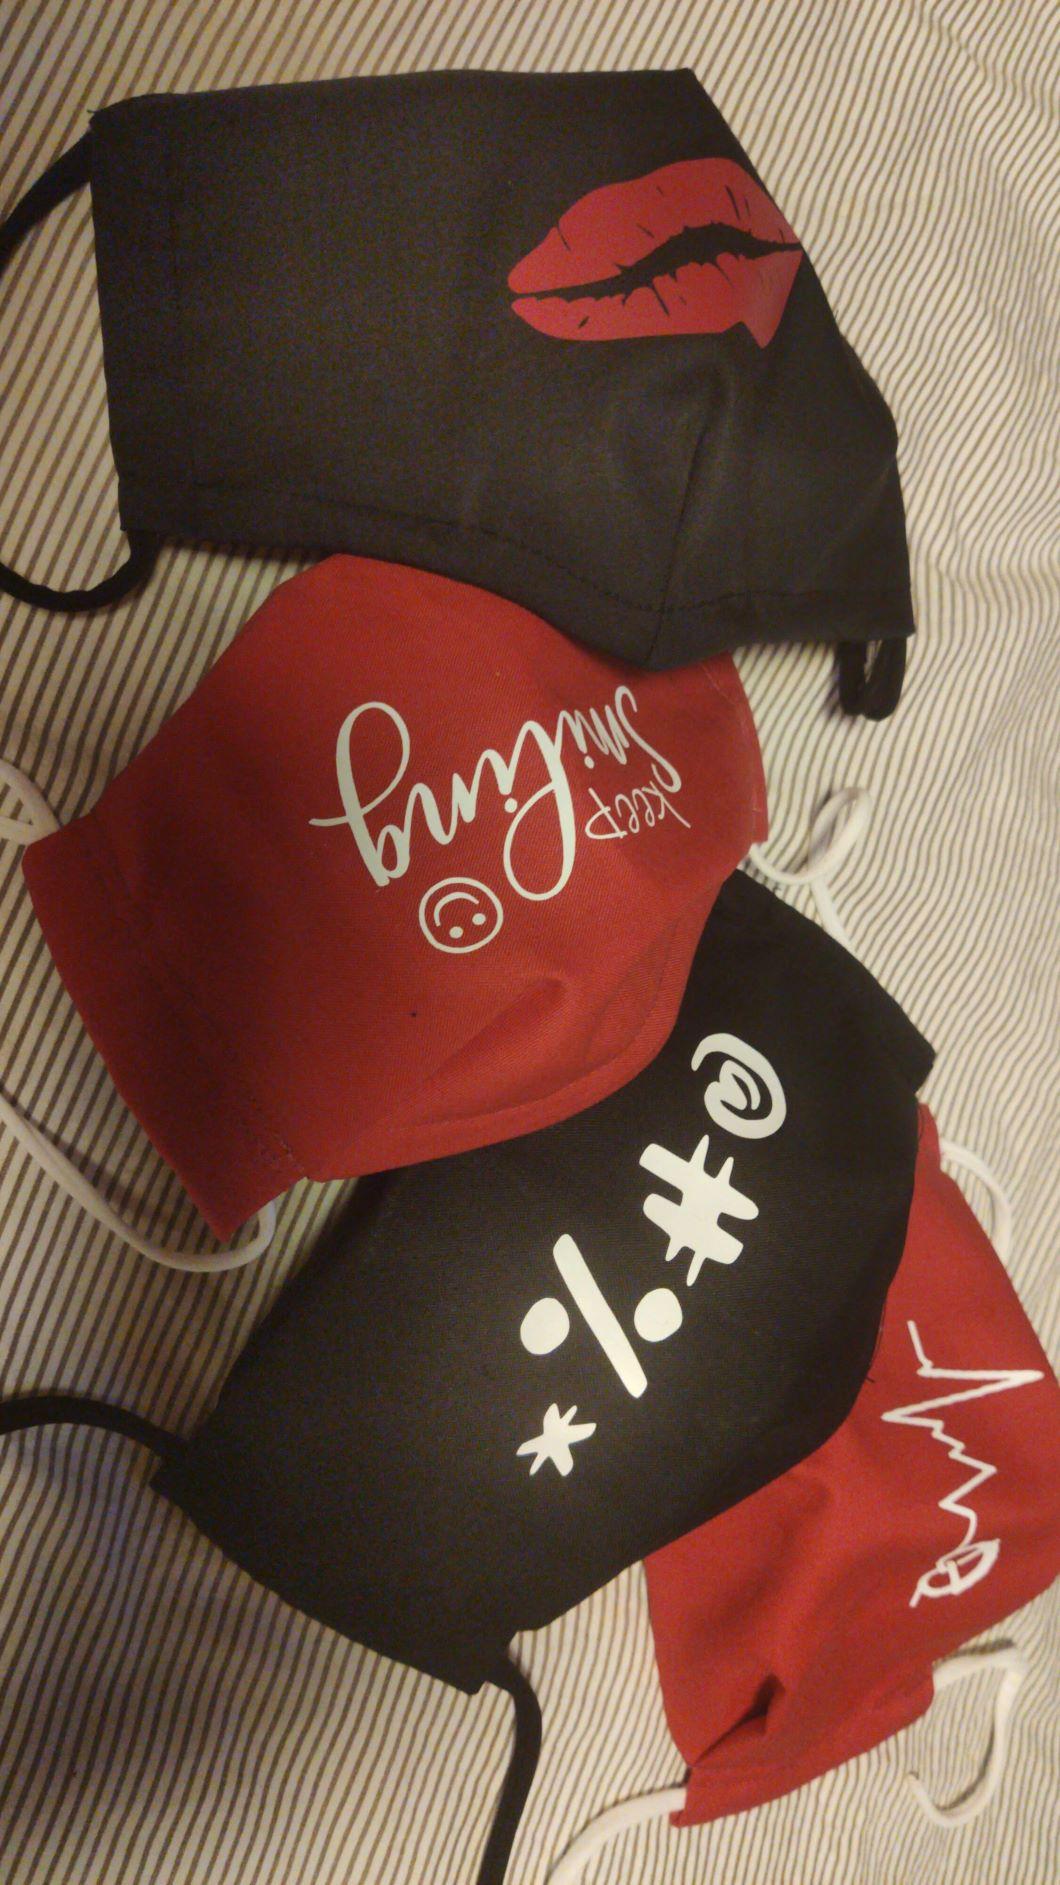 Alltagsmaske (Korb) mit Wunschplott